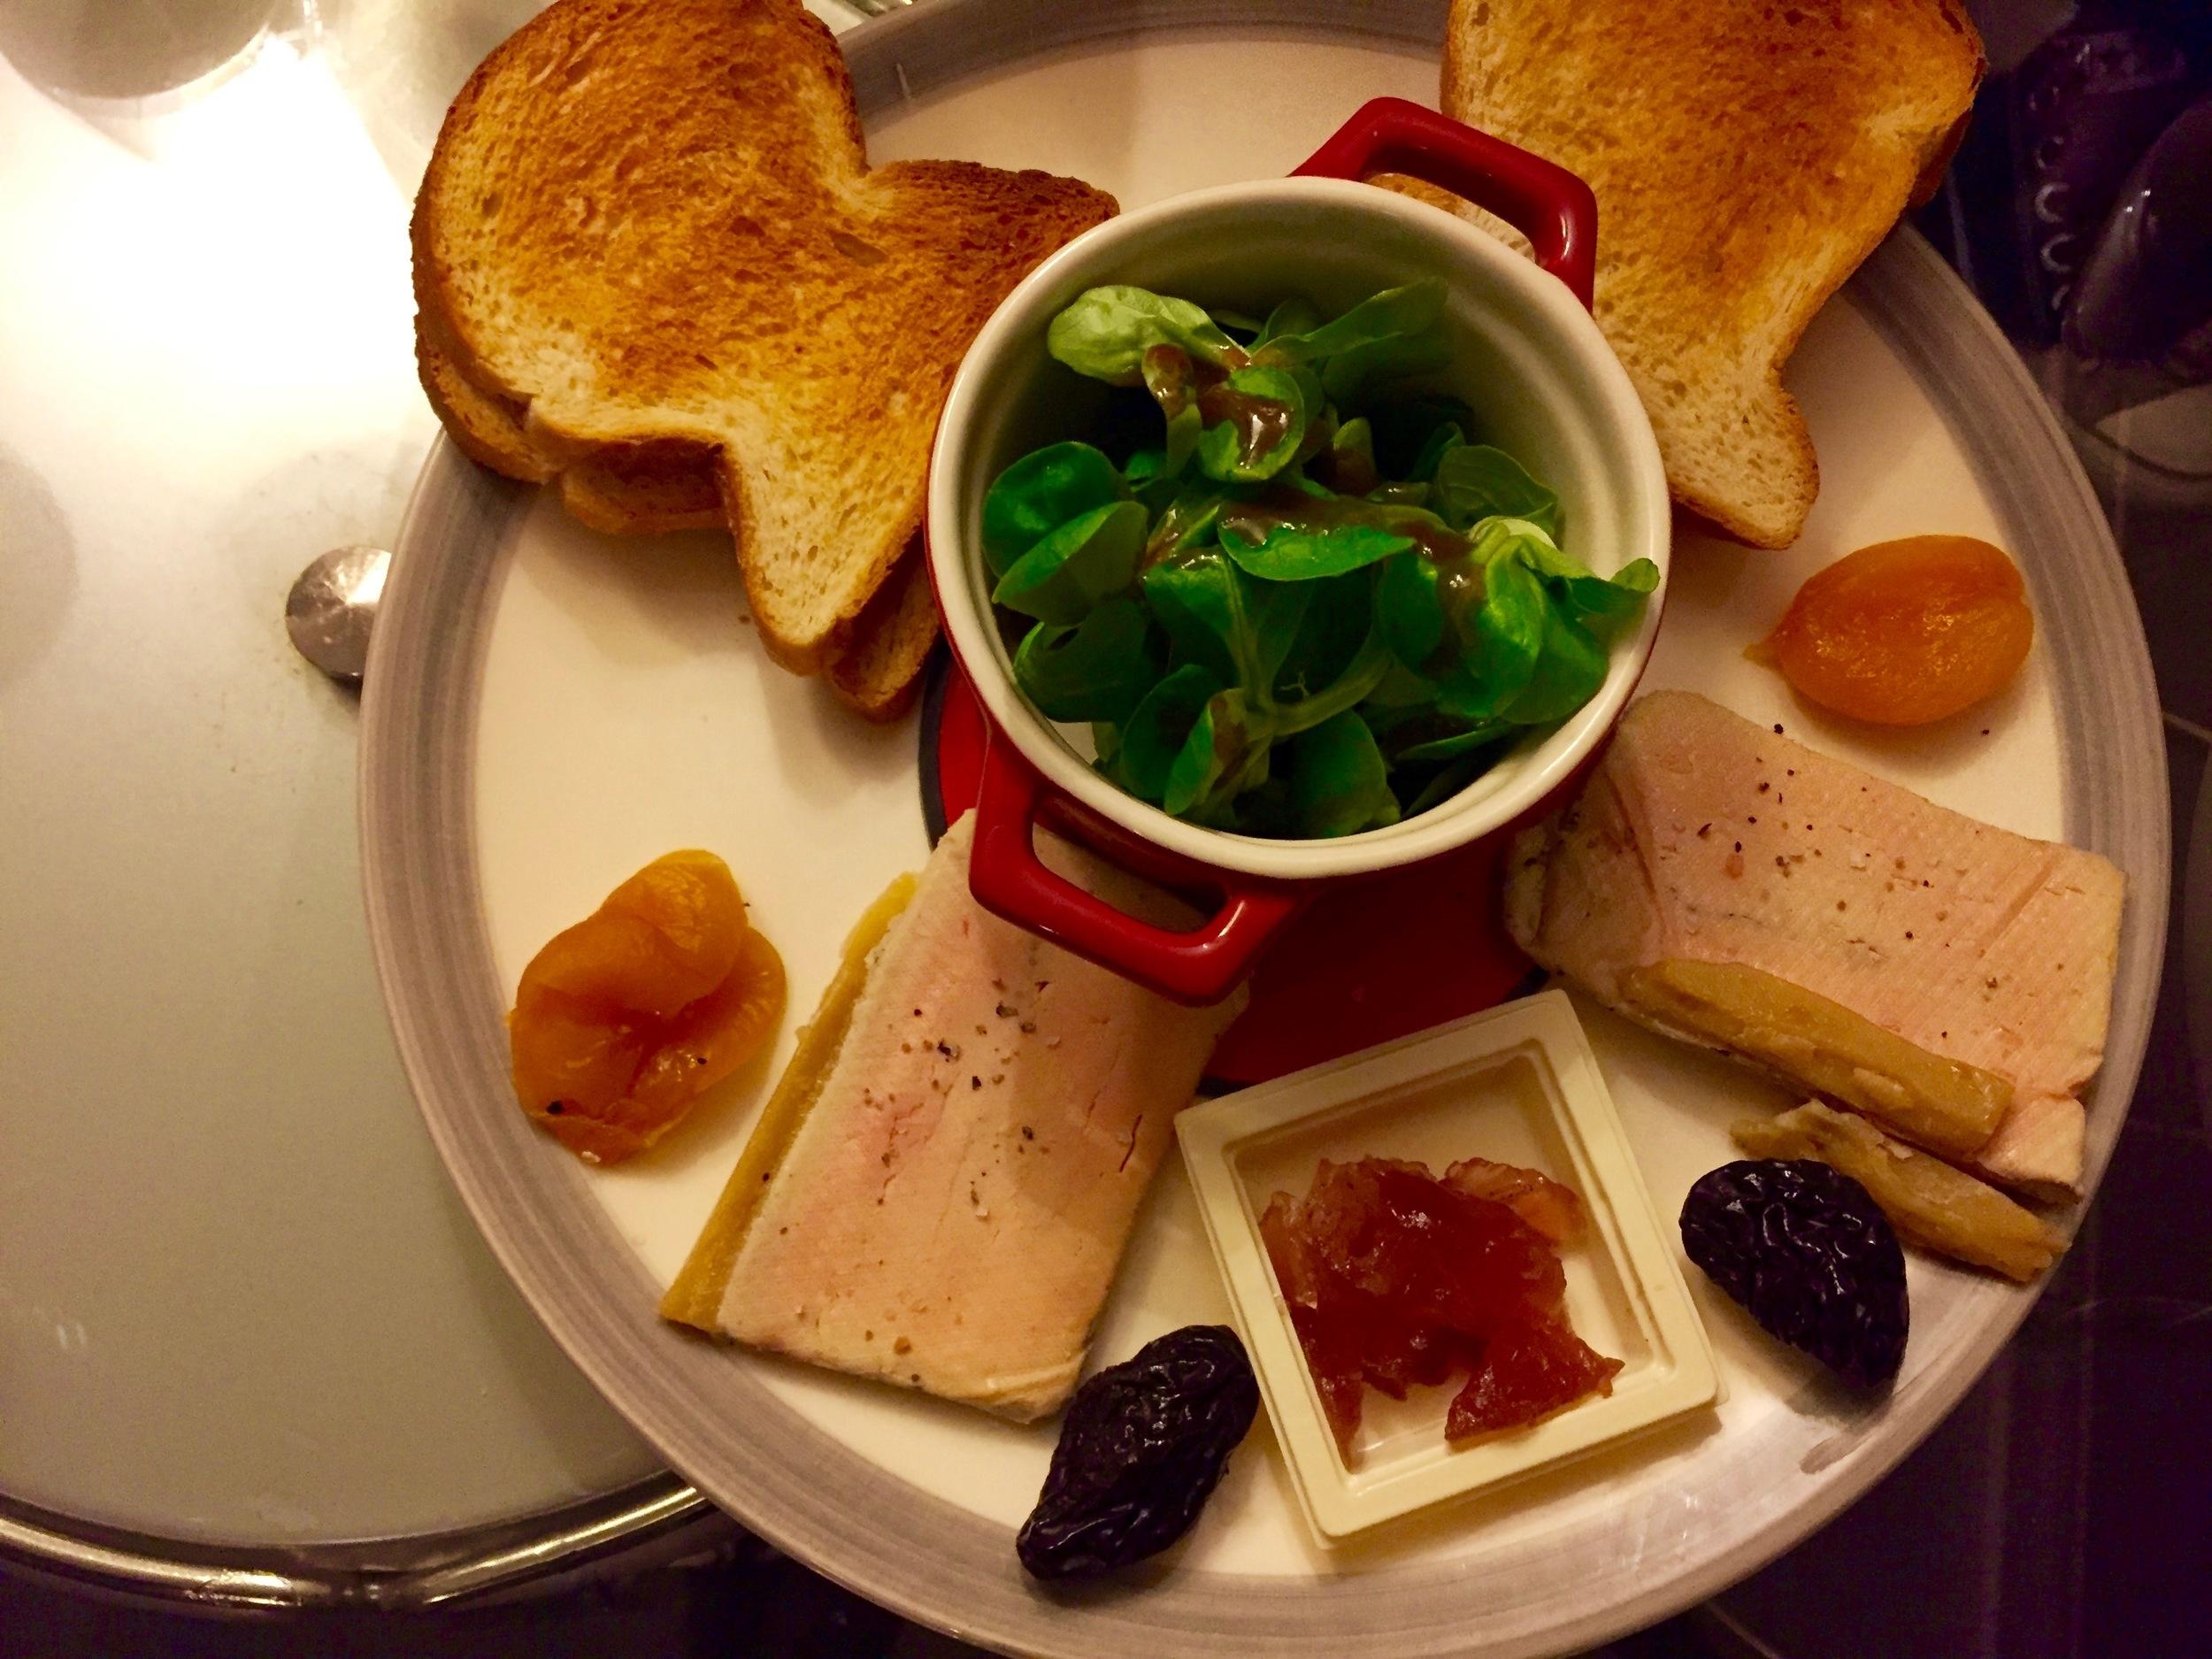 Feasting Pretty: Never enough foie gras